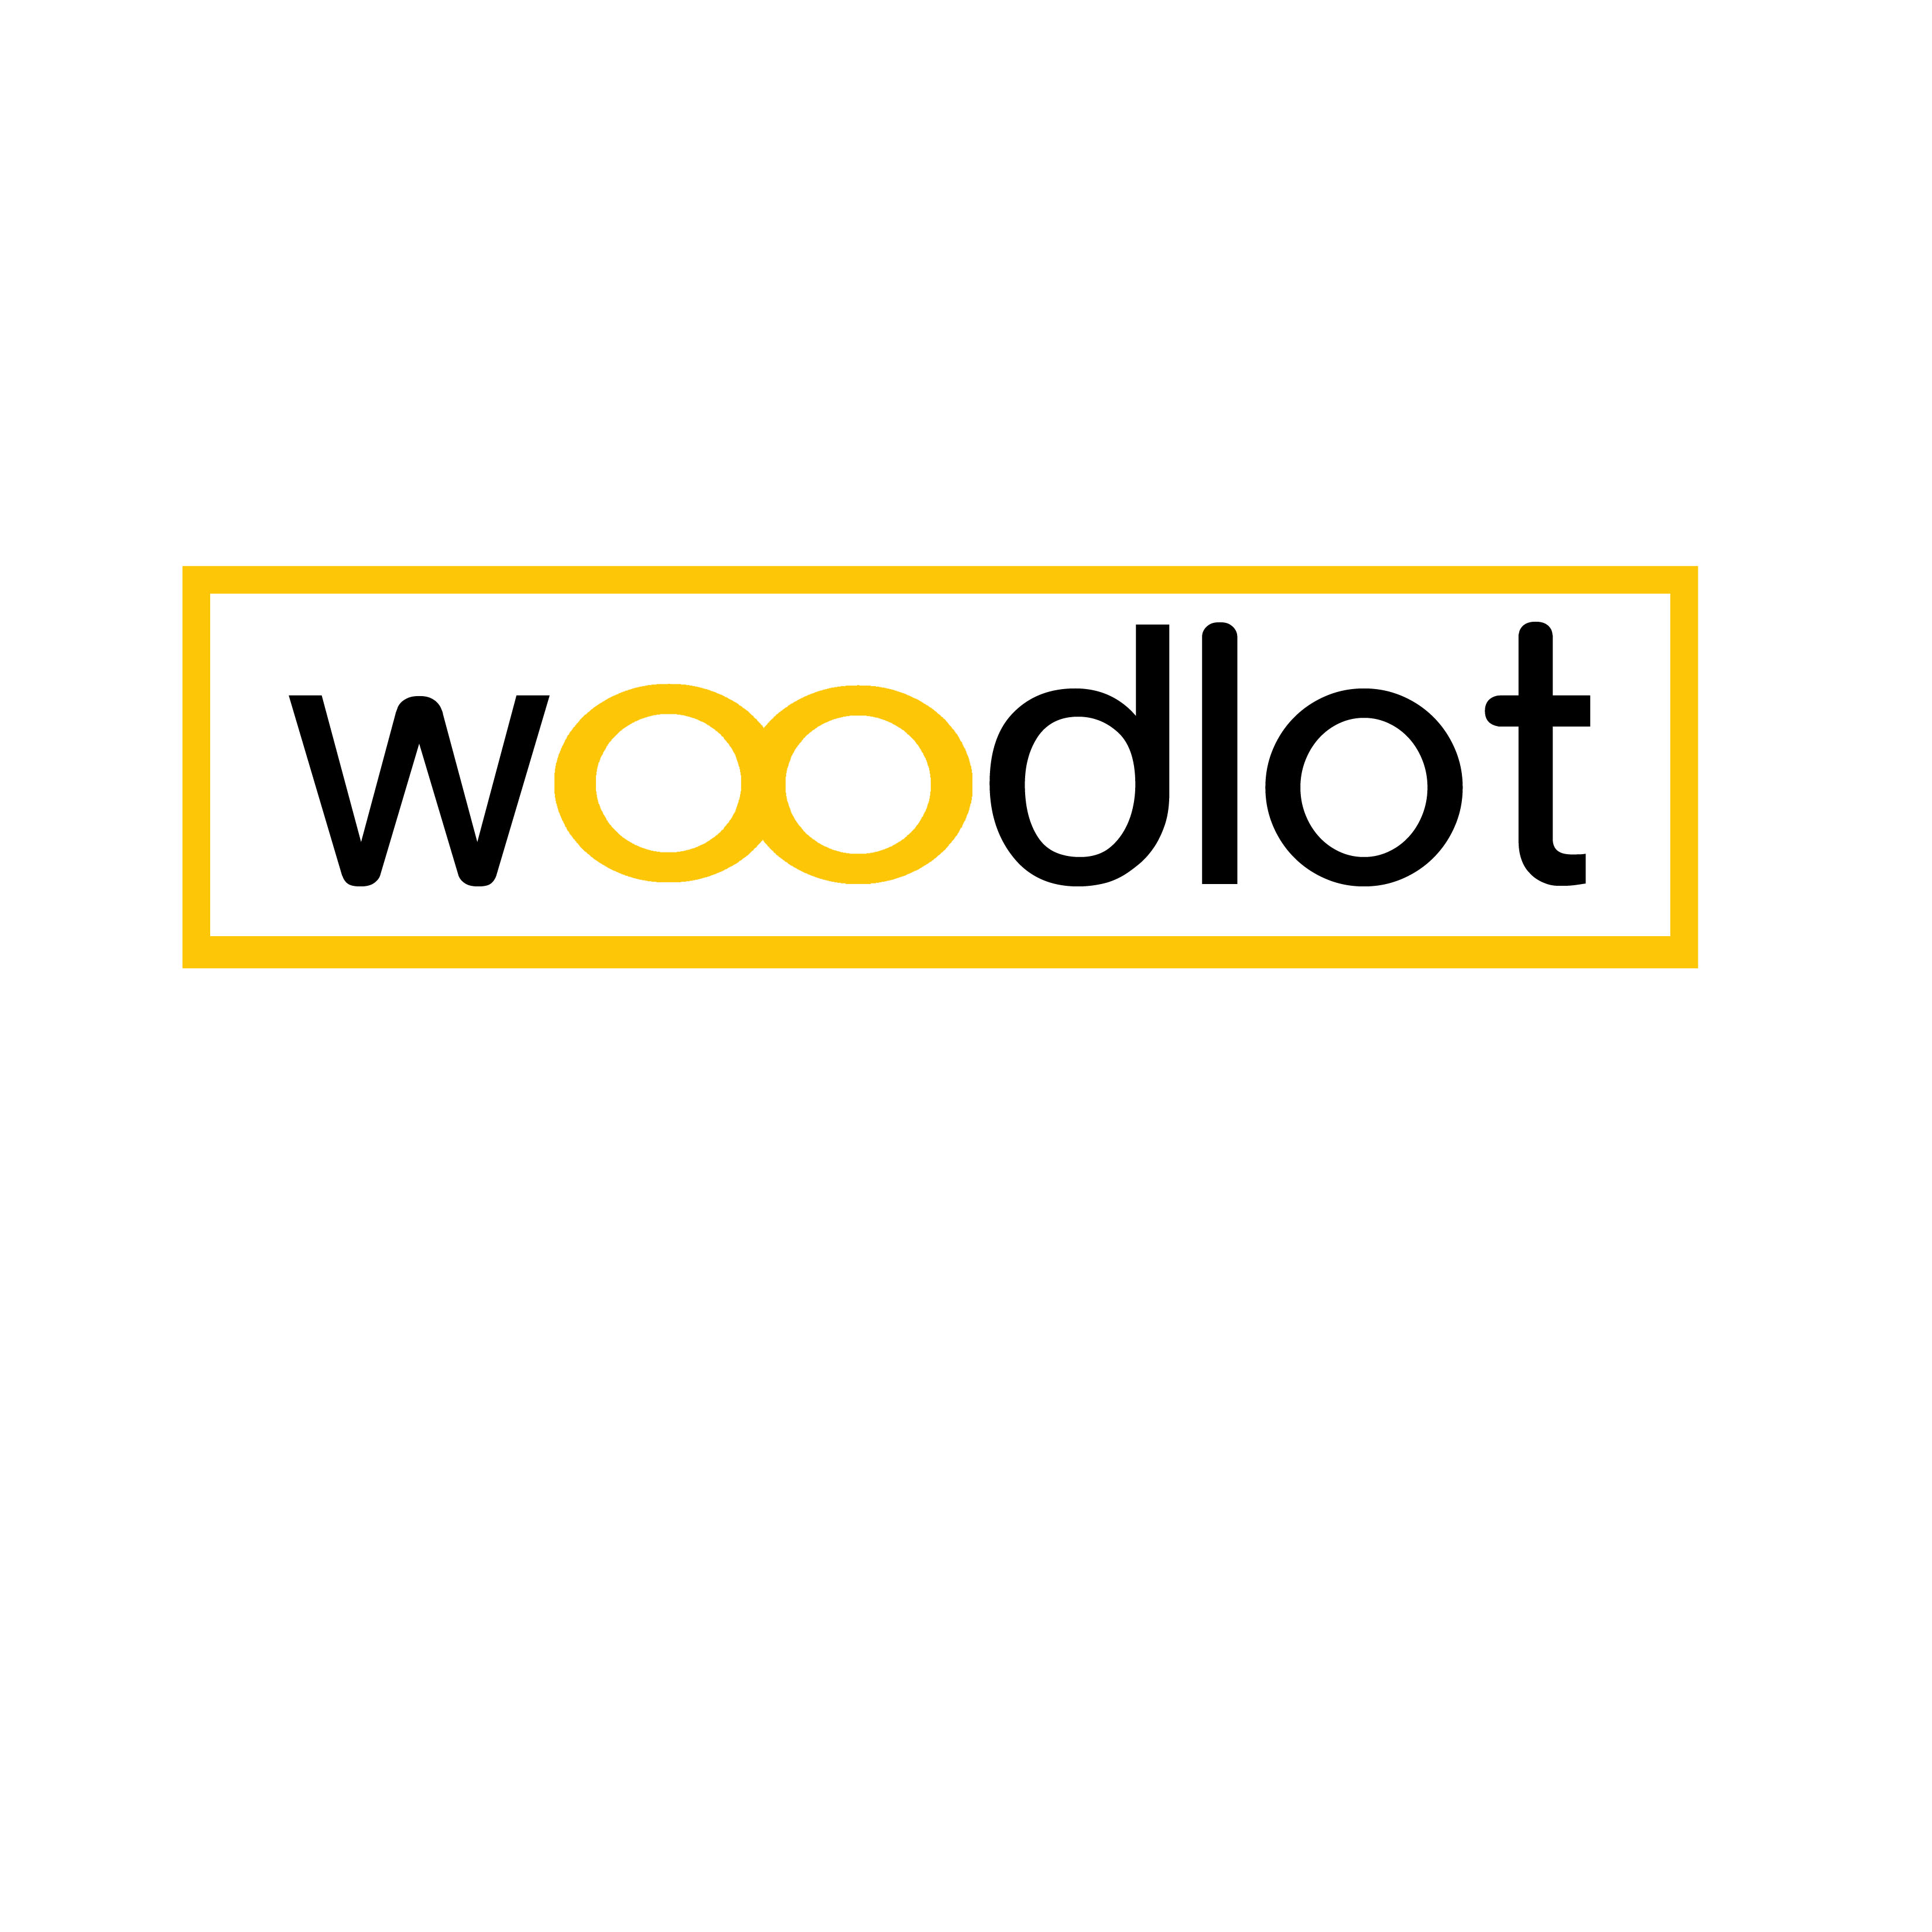 Logo Design by Allan Esclamado - Entry No. 10 in the Logo Design Contest Fun Logo Design for woodlot.